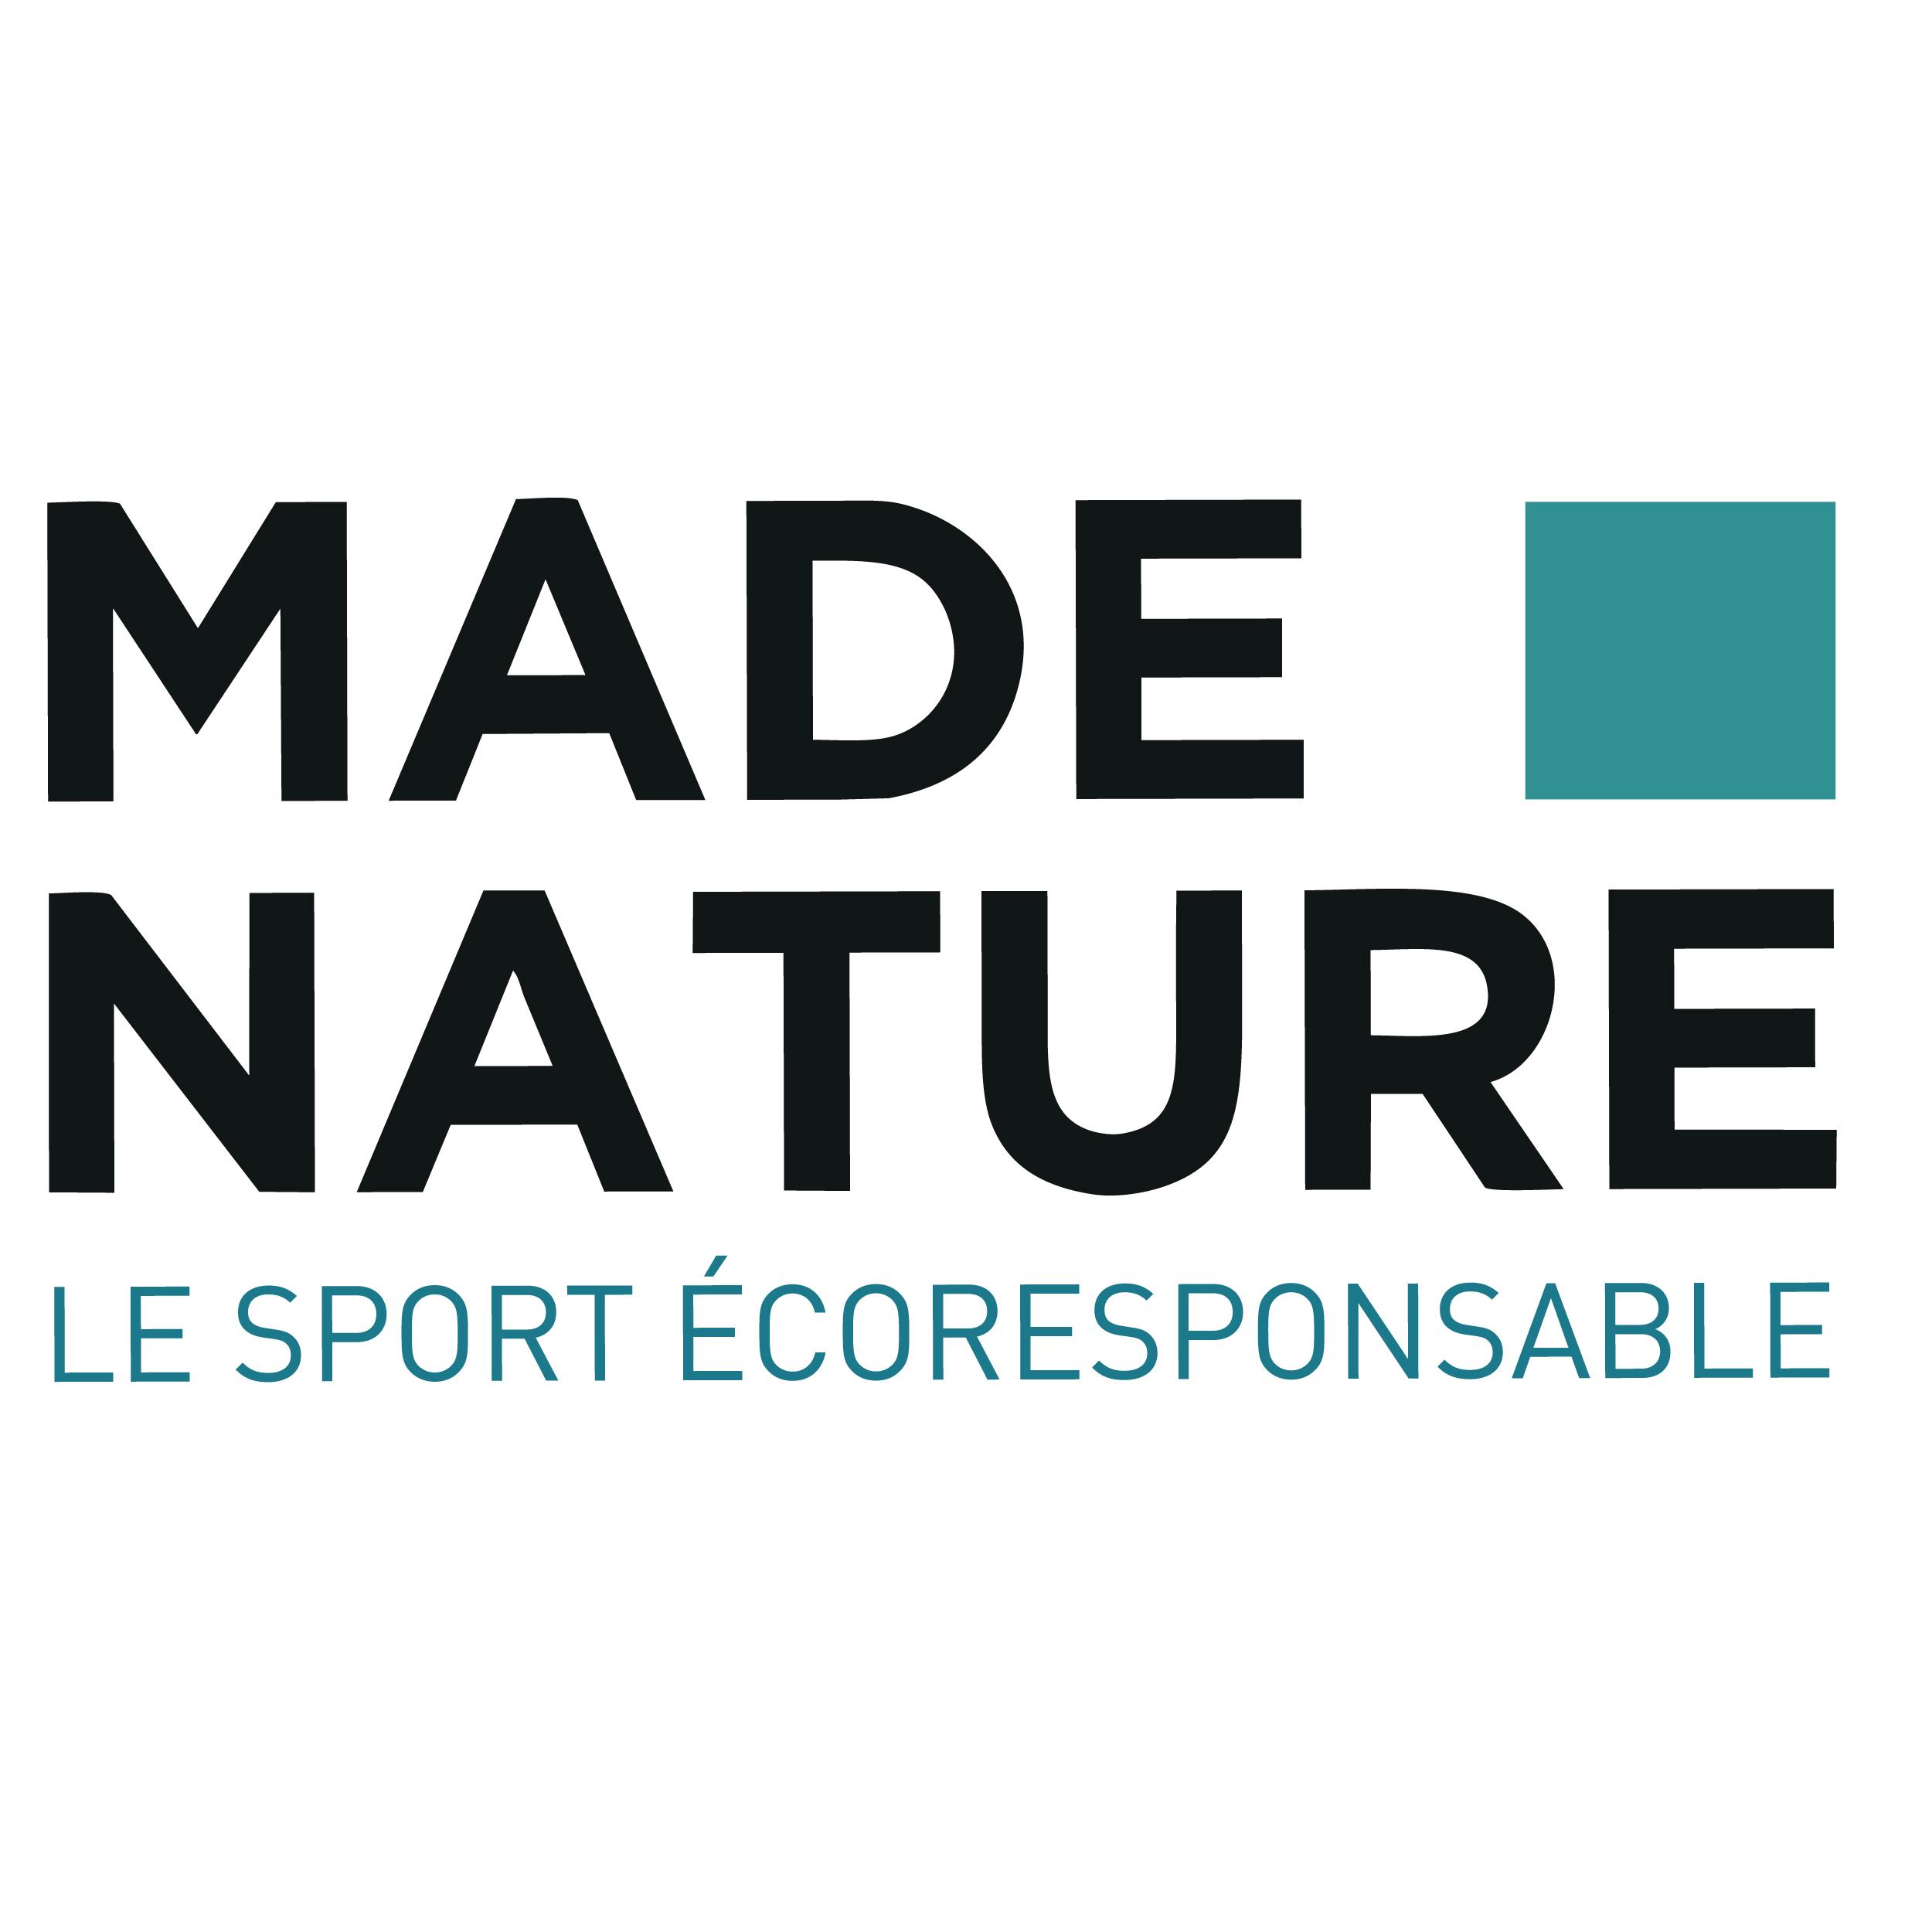 Made Nature